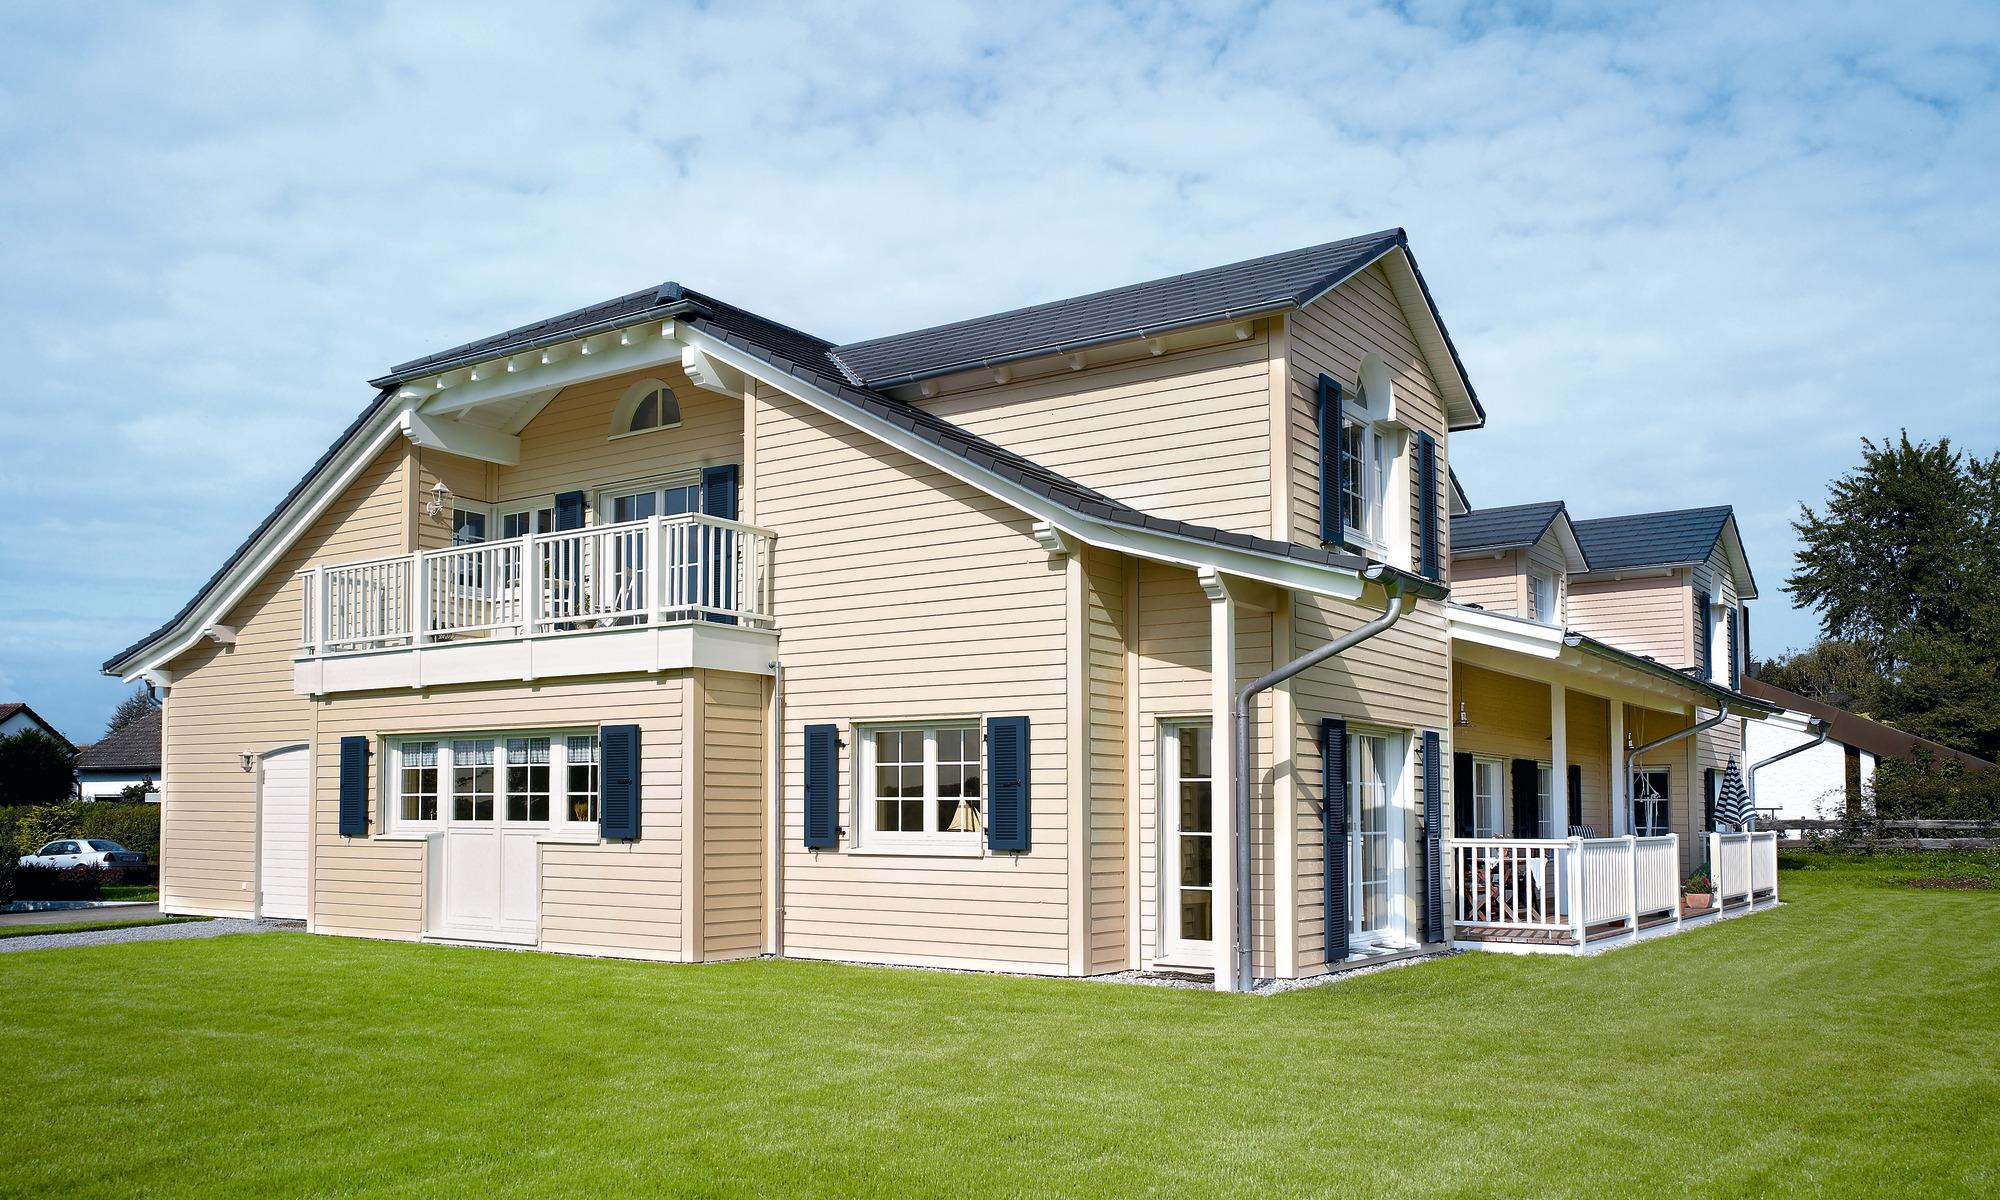 Custom-built timber frame home